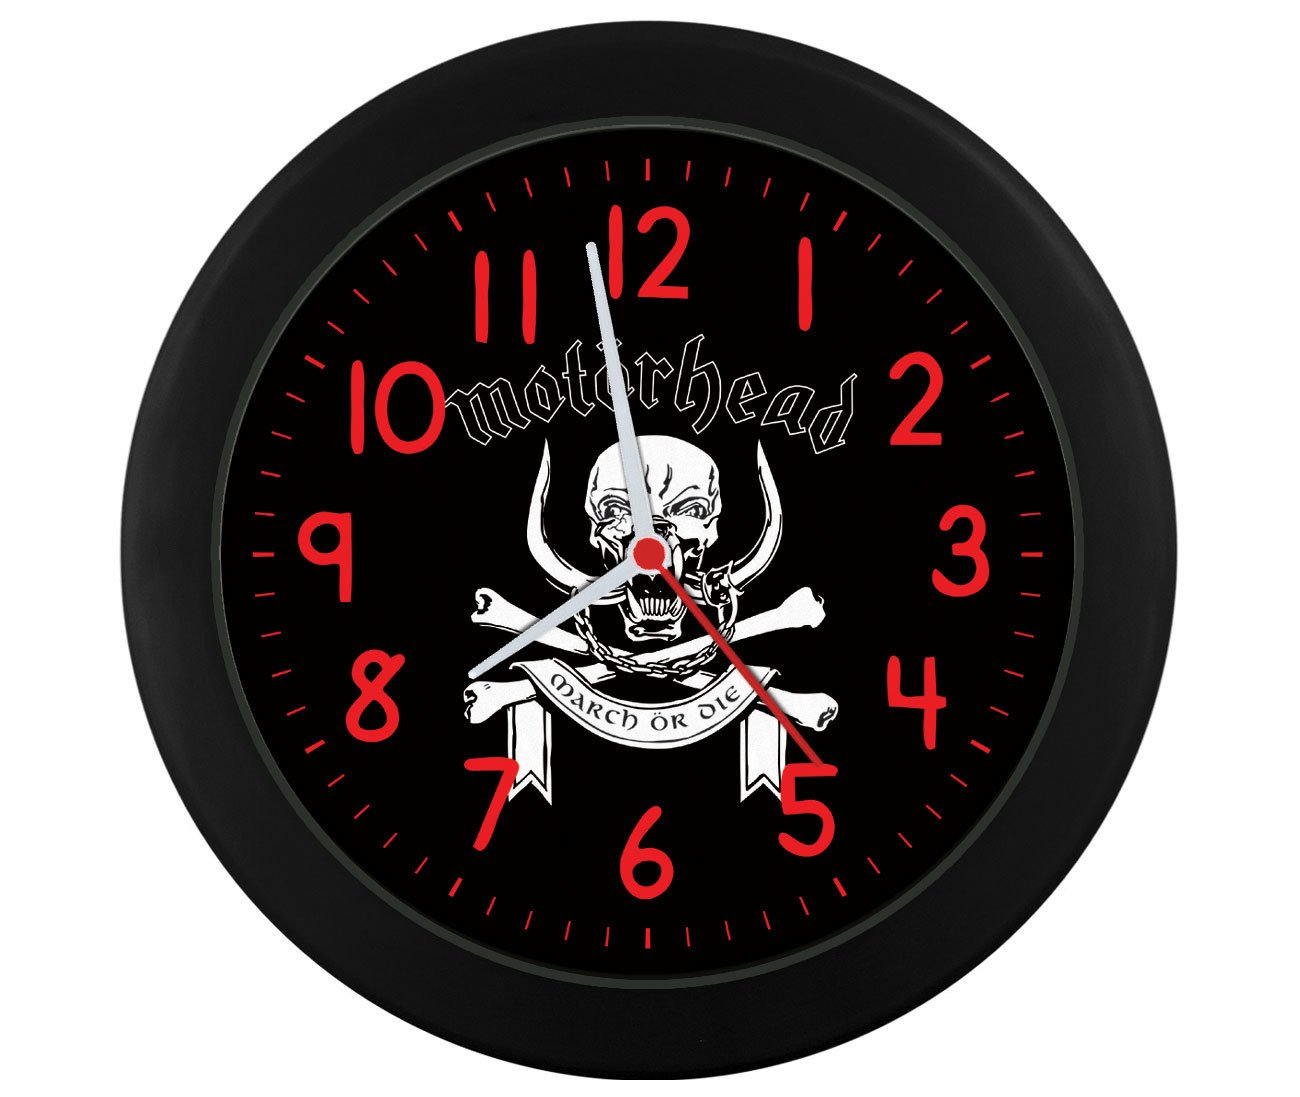 Relógio de parede Motorhead